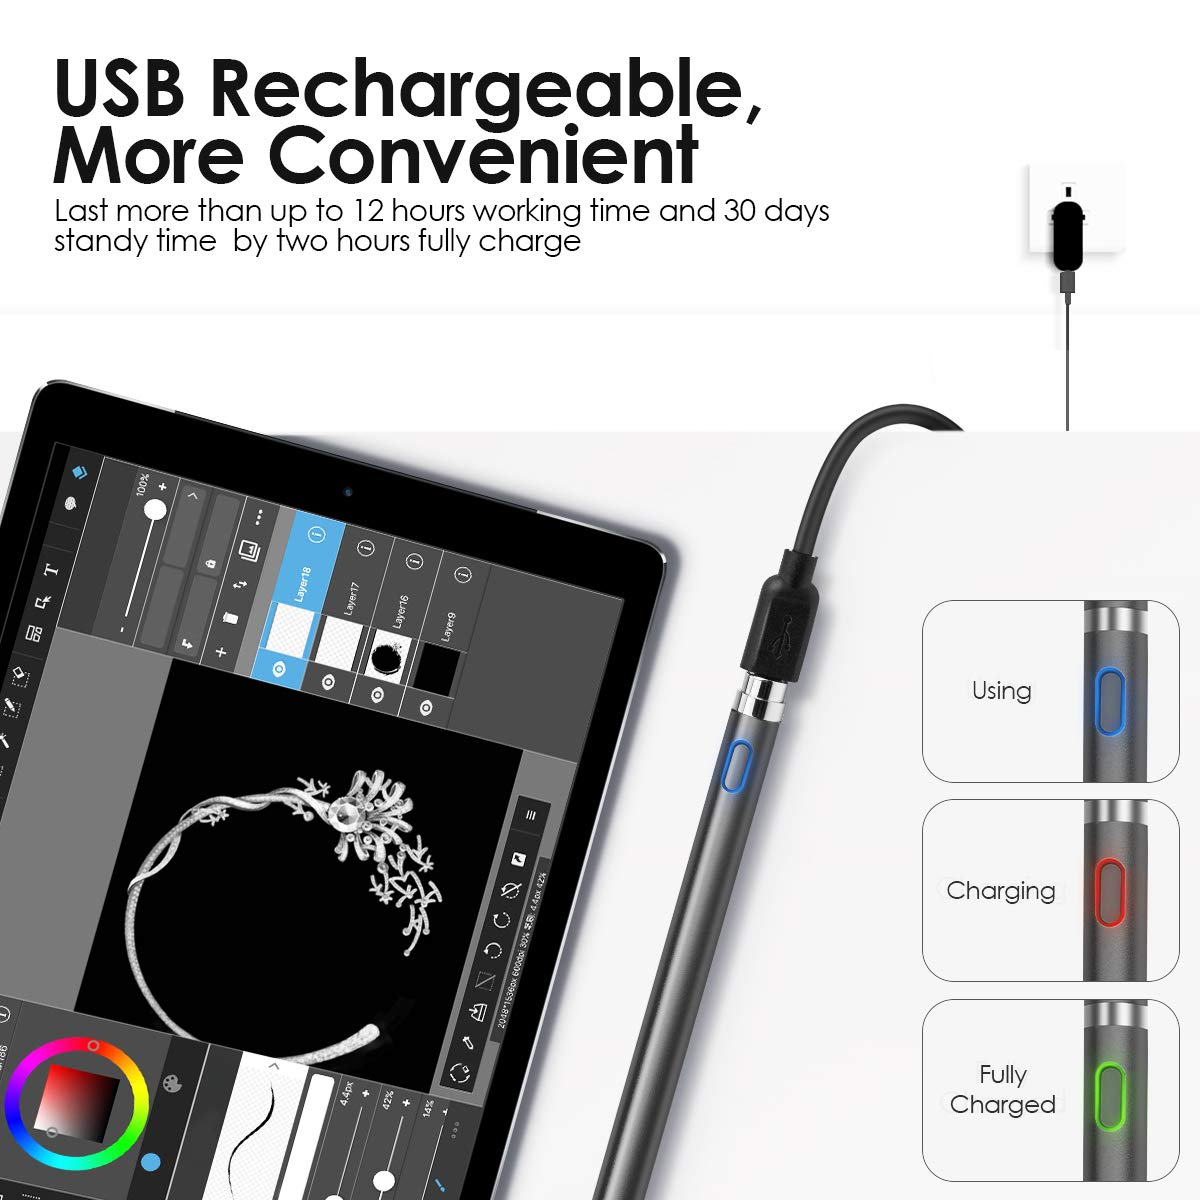 BACKTURE Penna Touch Huawei iphone Touchscreen e Tablet Samsung Smartphone Punta Ultra Fine da 1,5 mm Capacitiva Attiva Penna per iPad